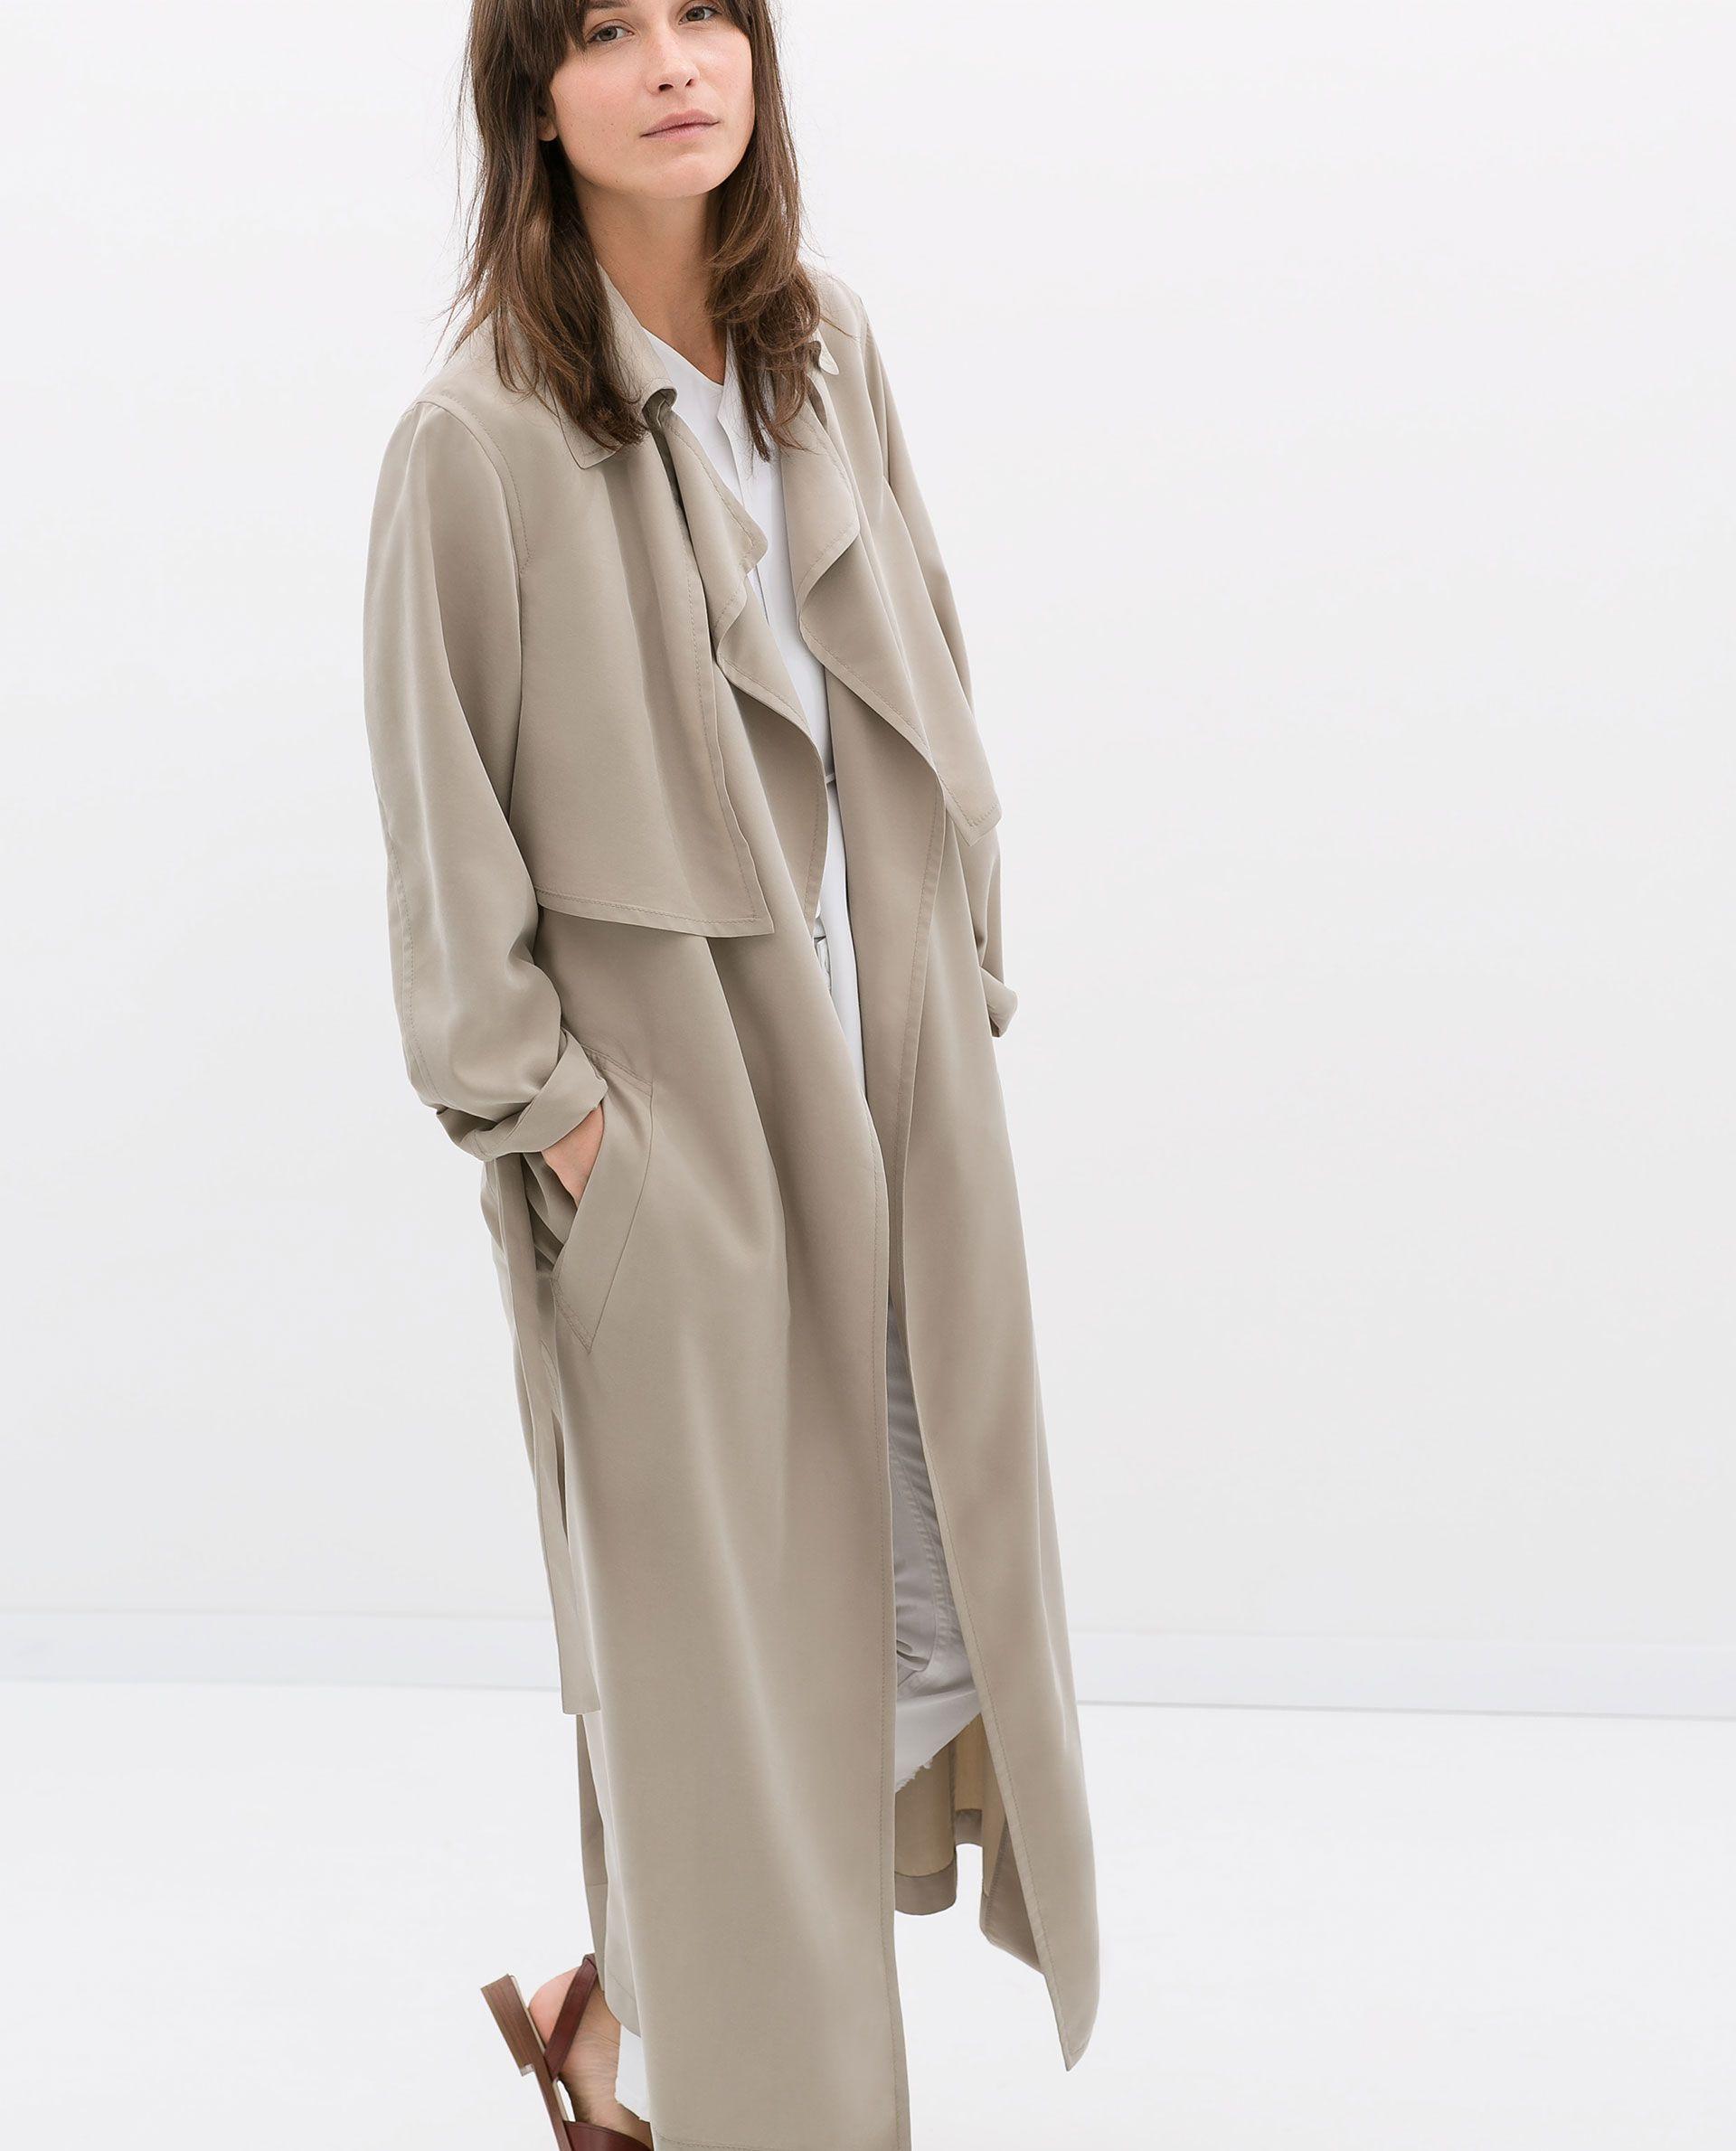 Zara Studio Long Flowy Trenchcoat Fashion Fashion Gone